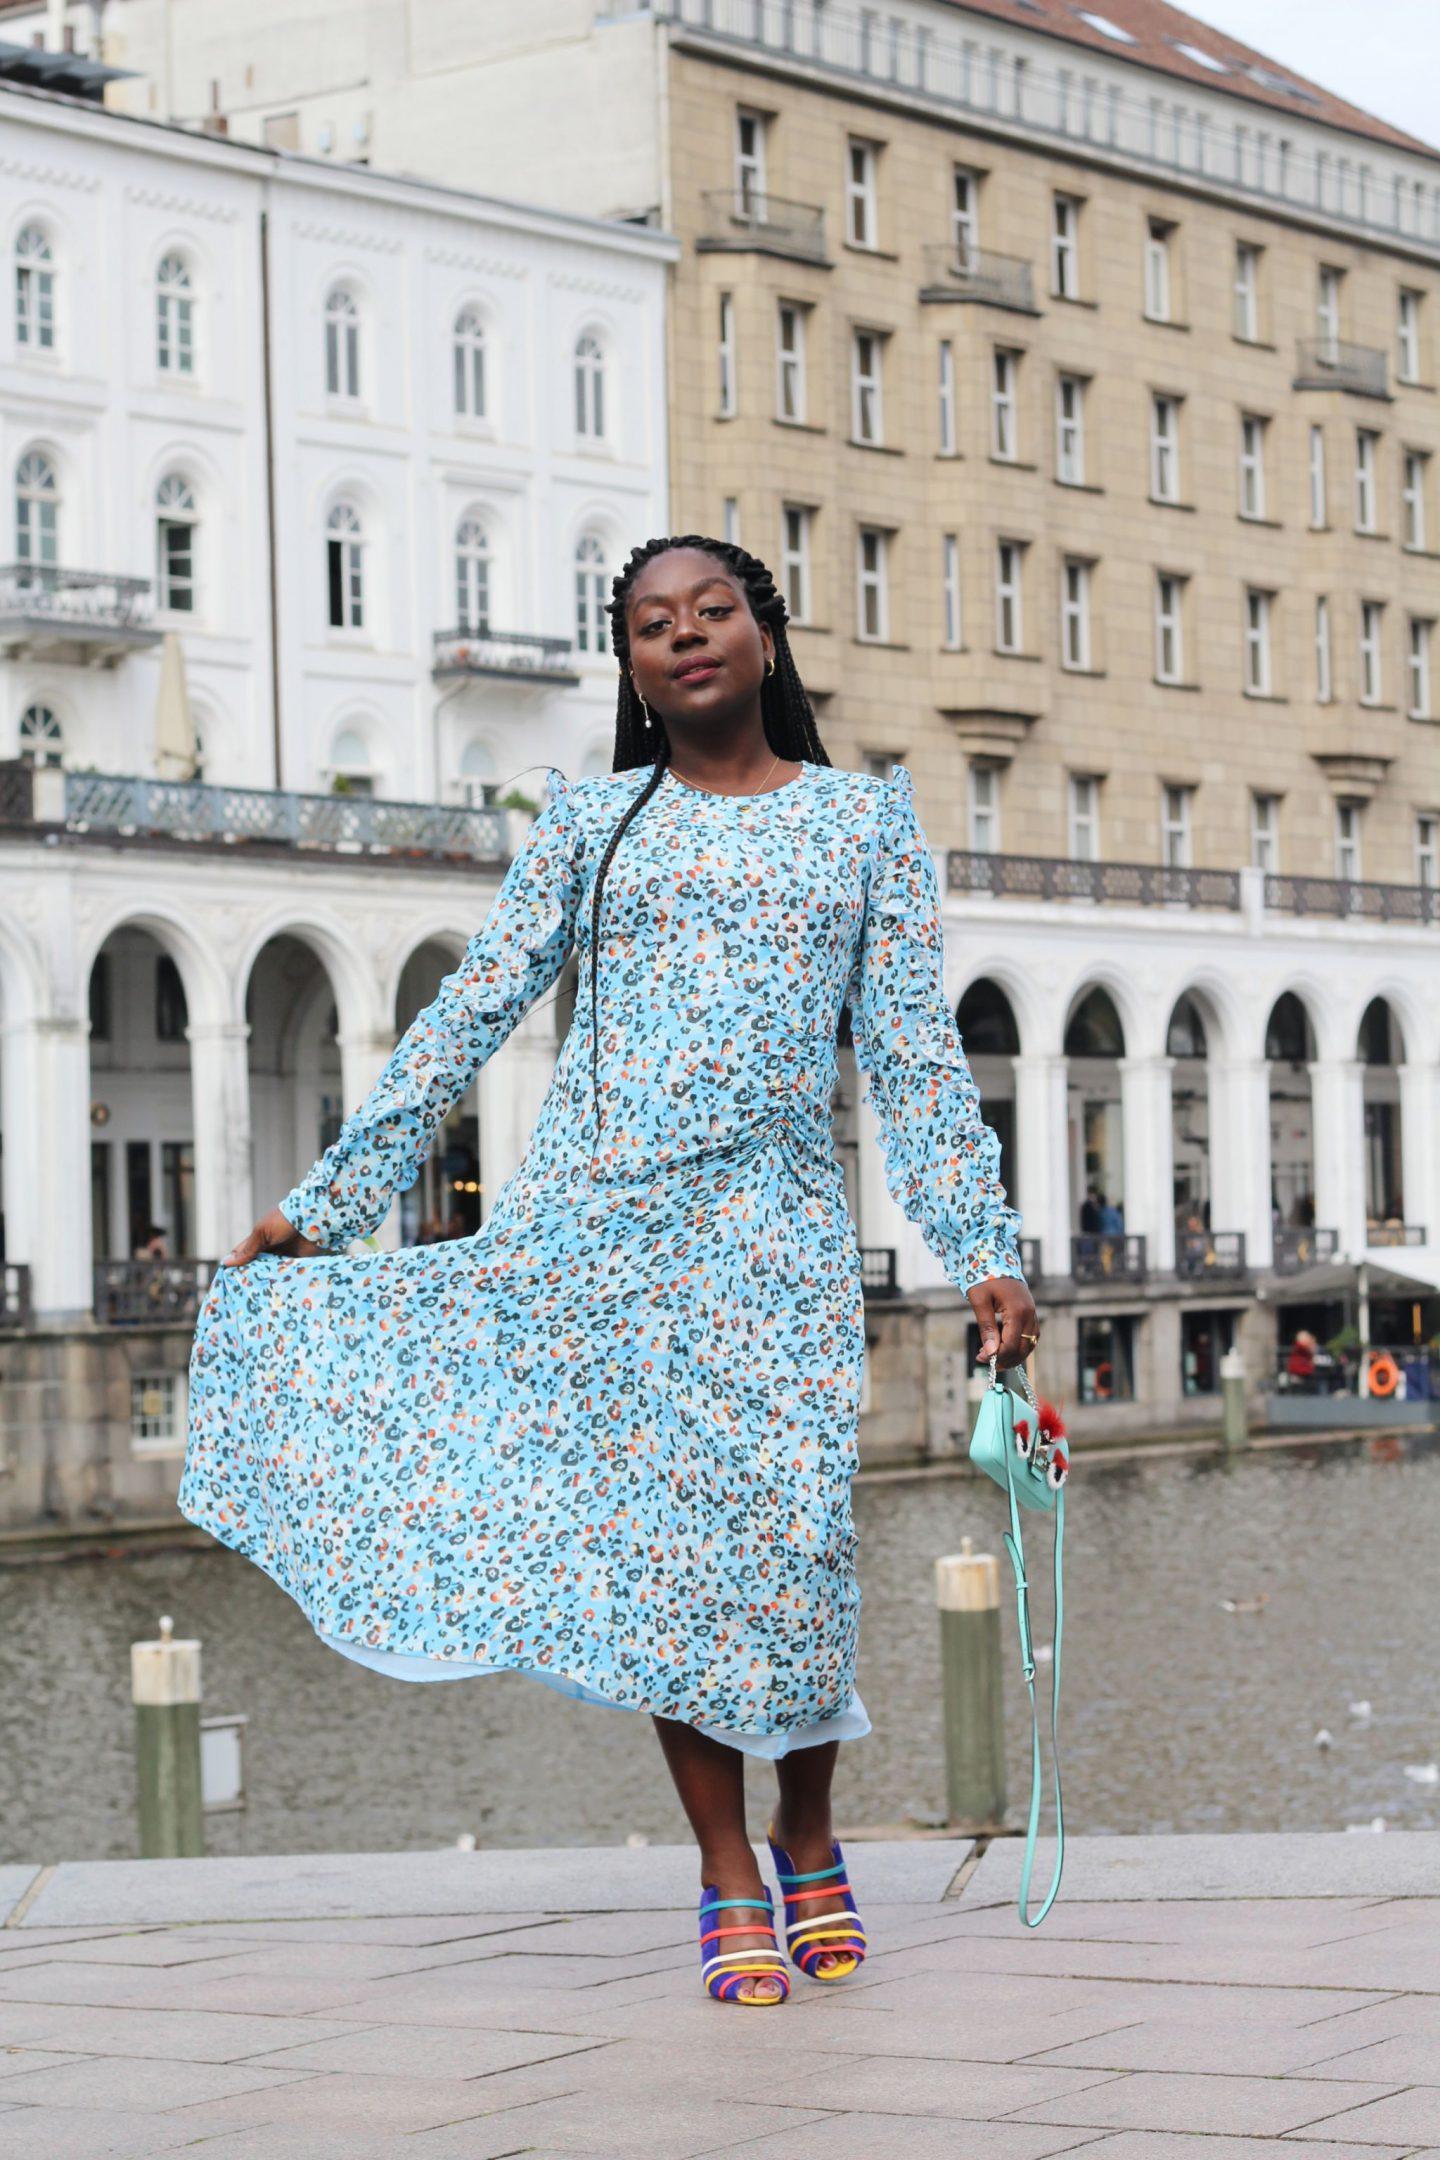 Lala_Berlin_Streetstyle_Lois_Opoku_Fashion_Blogger_Fendi_Monster_Malone_Souliers_lisforlois_13